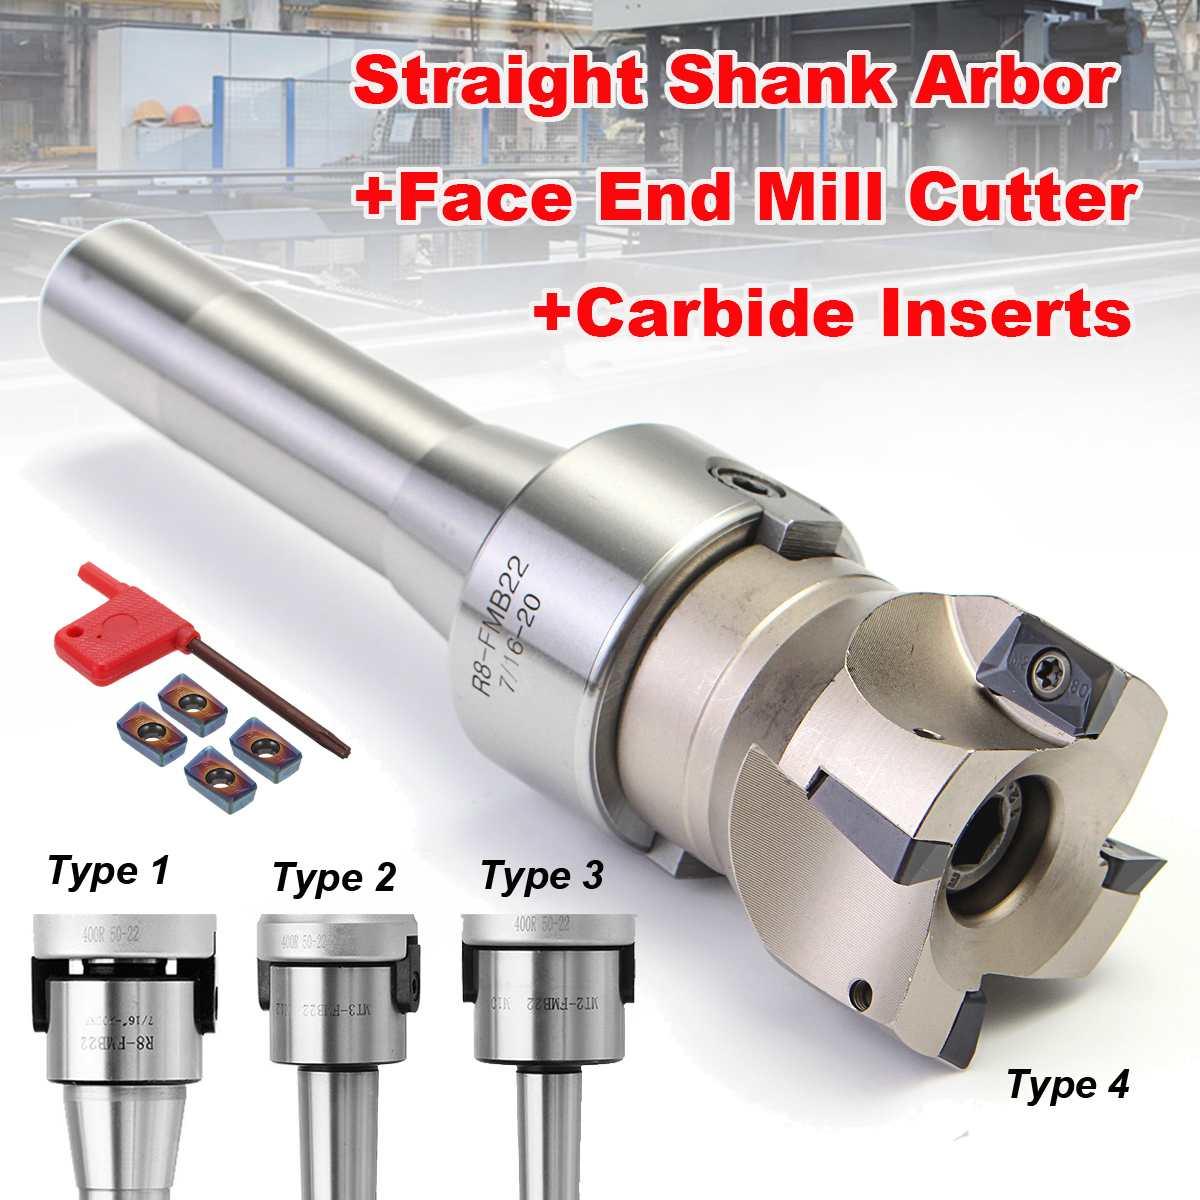 90 Degree R8 FMB22/MT2/MT3 Straight Shank Arbor+Face End Mill Cutter+4pcs APMT1604 Carbide Inserts/Blue-Nano Insert Turning Tool